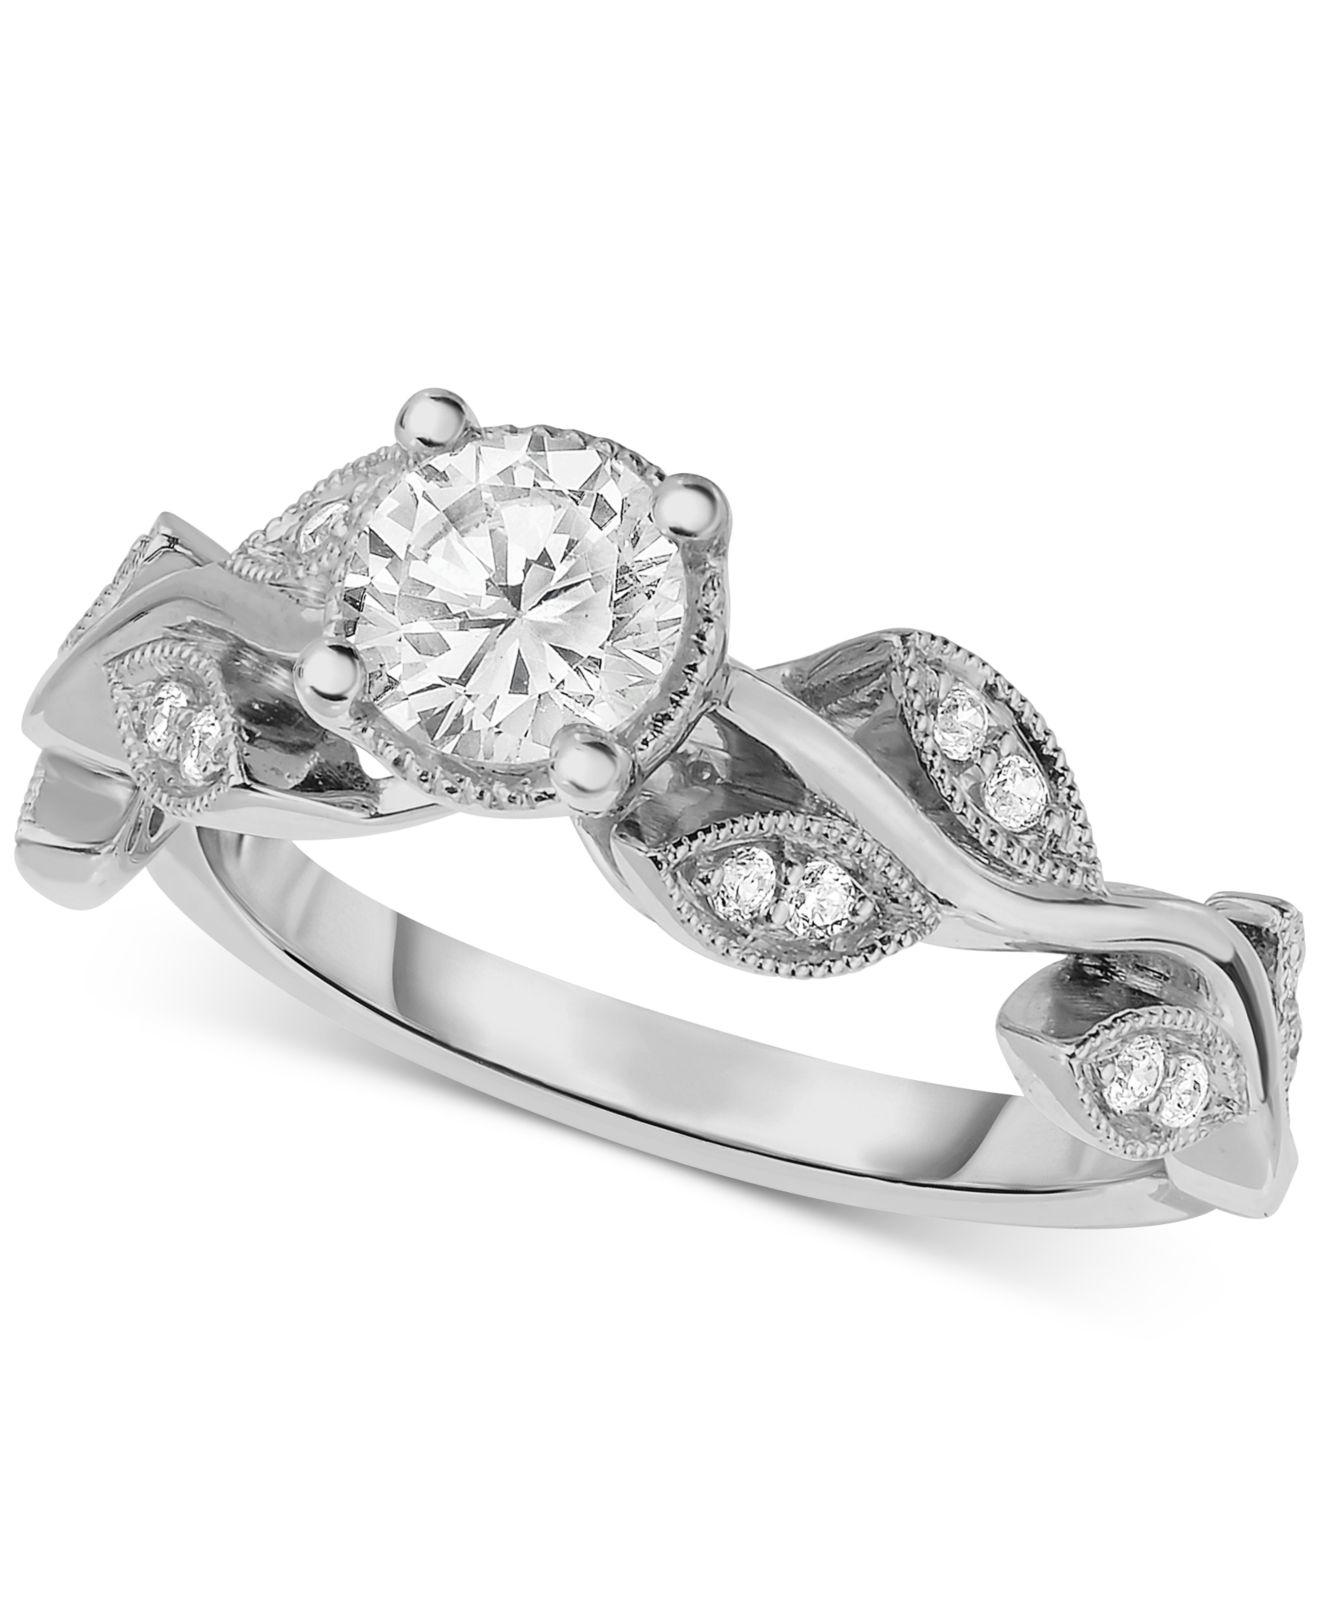 Macy's Diamond Vine-inspired Engagement Ring (5/8 Ct. T.w